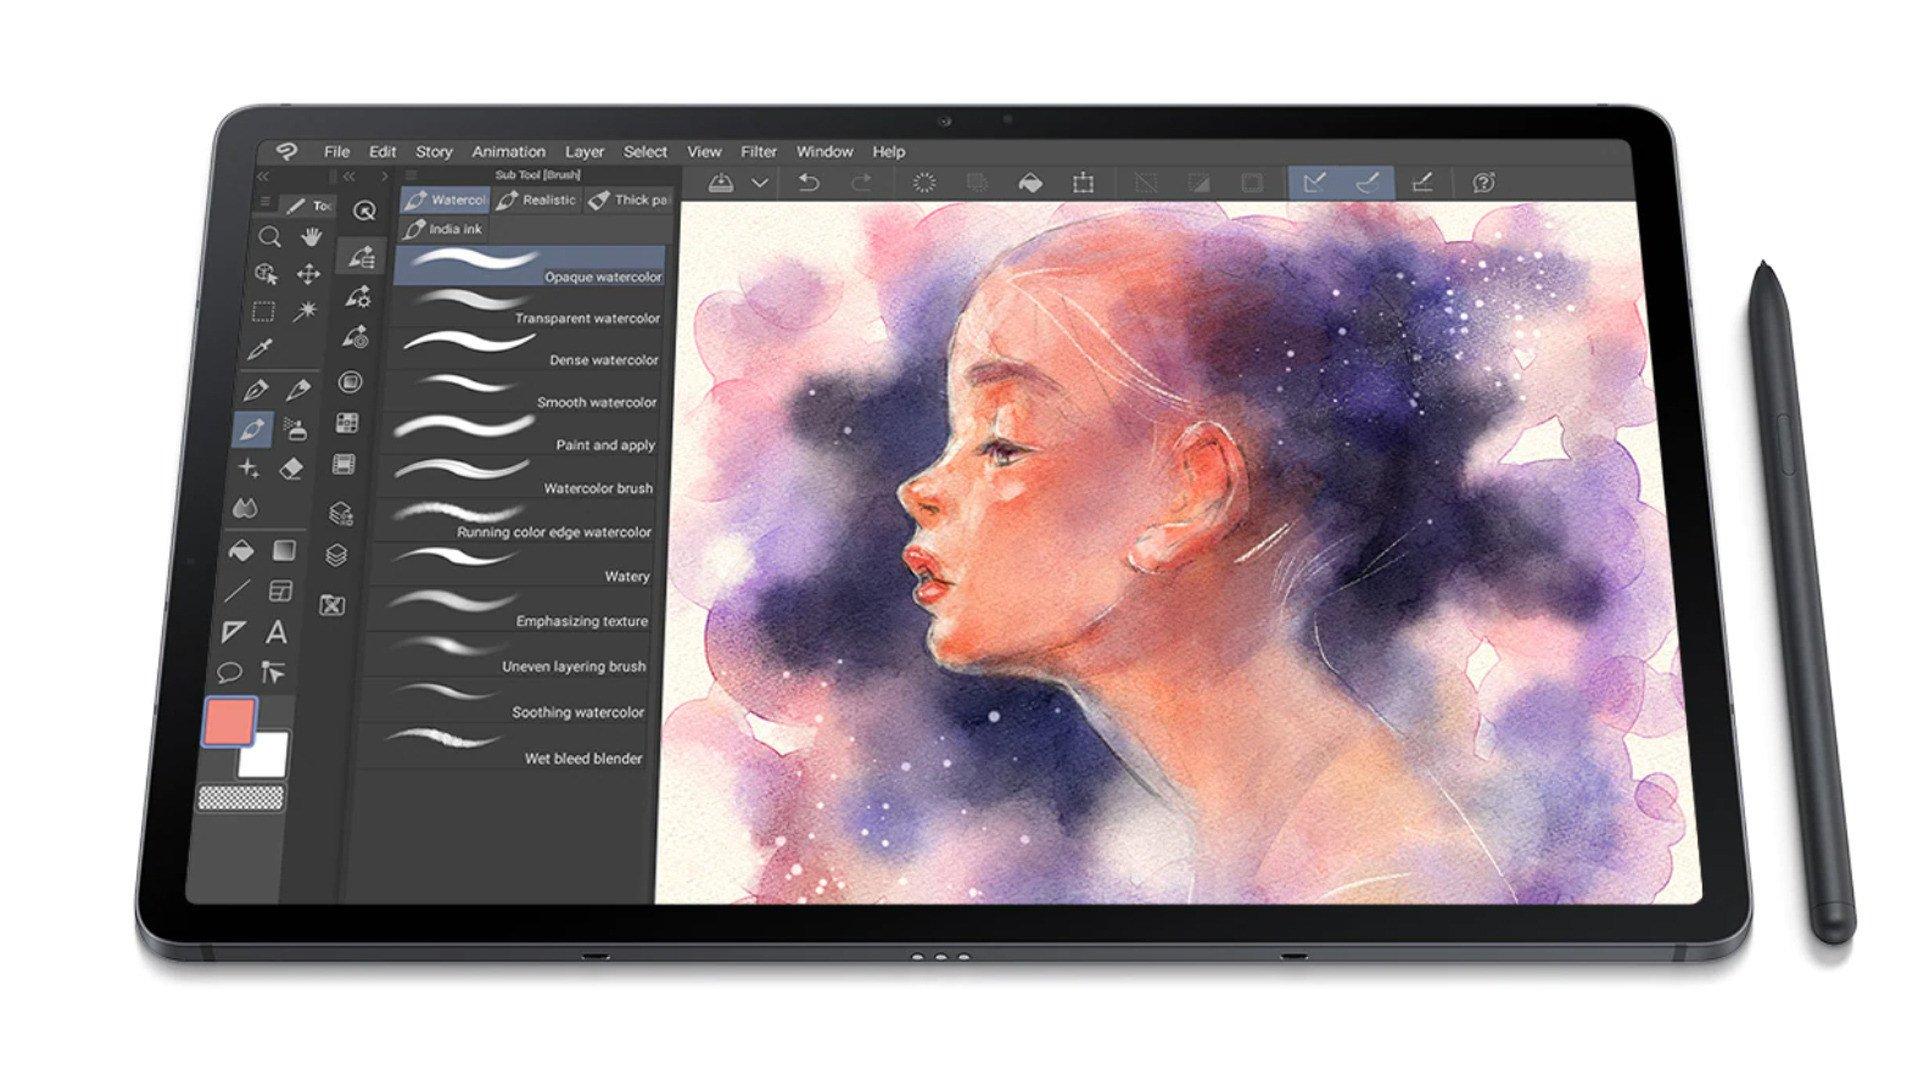 Samsung Galaxy Tab S7 FE: упрощённая версия Galaxy Tab S7 с экраном на 12.4, чипом Snapdragon 750G и стилусом S Pen за 649 евро